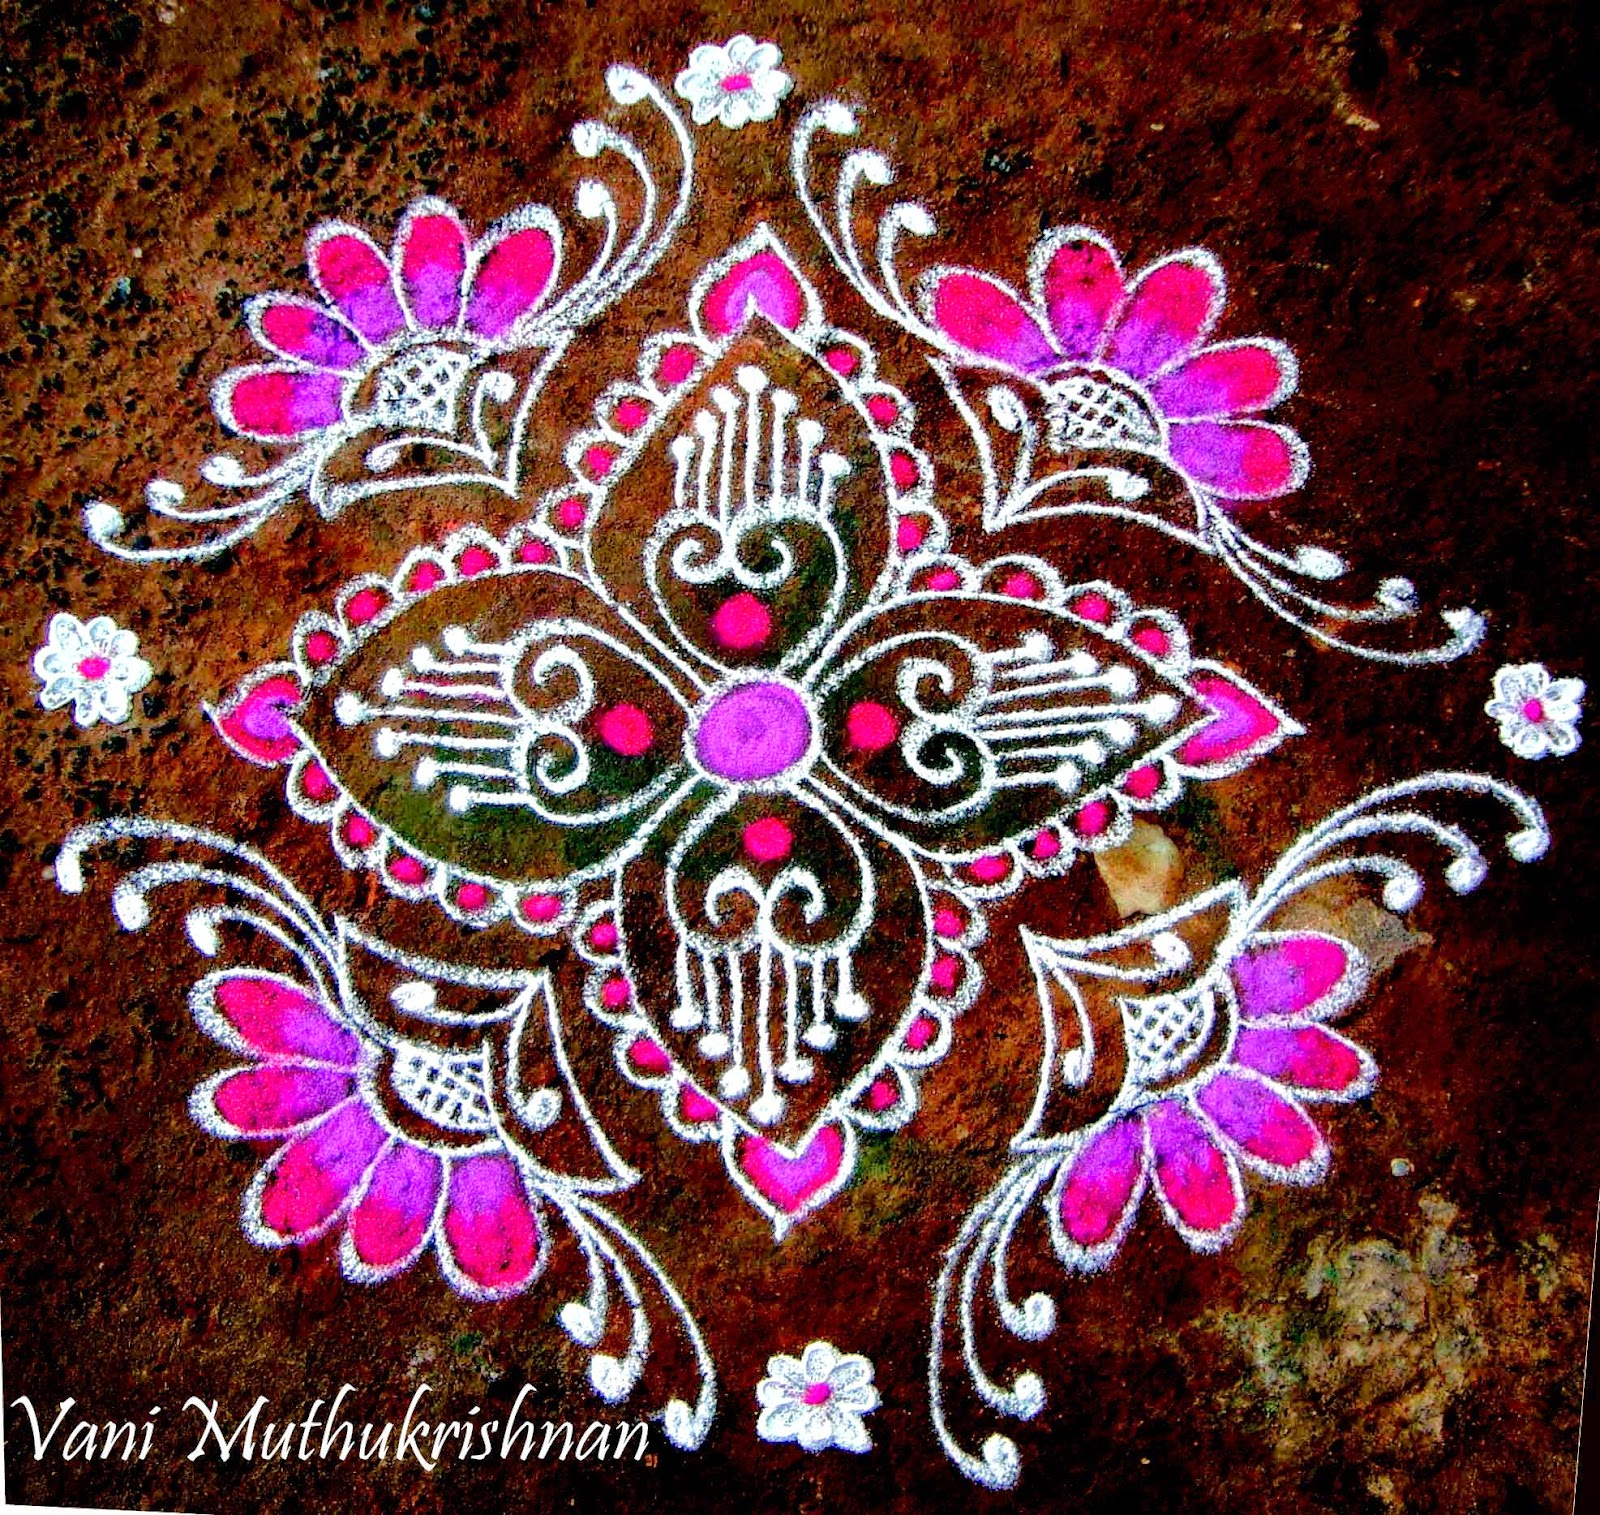 Wedding Kolam Images: 45+ Kolam Designs For Festivals